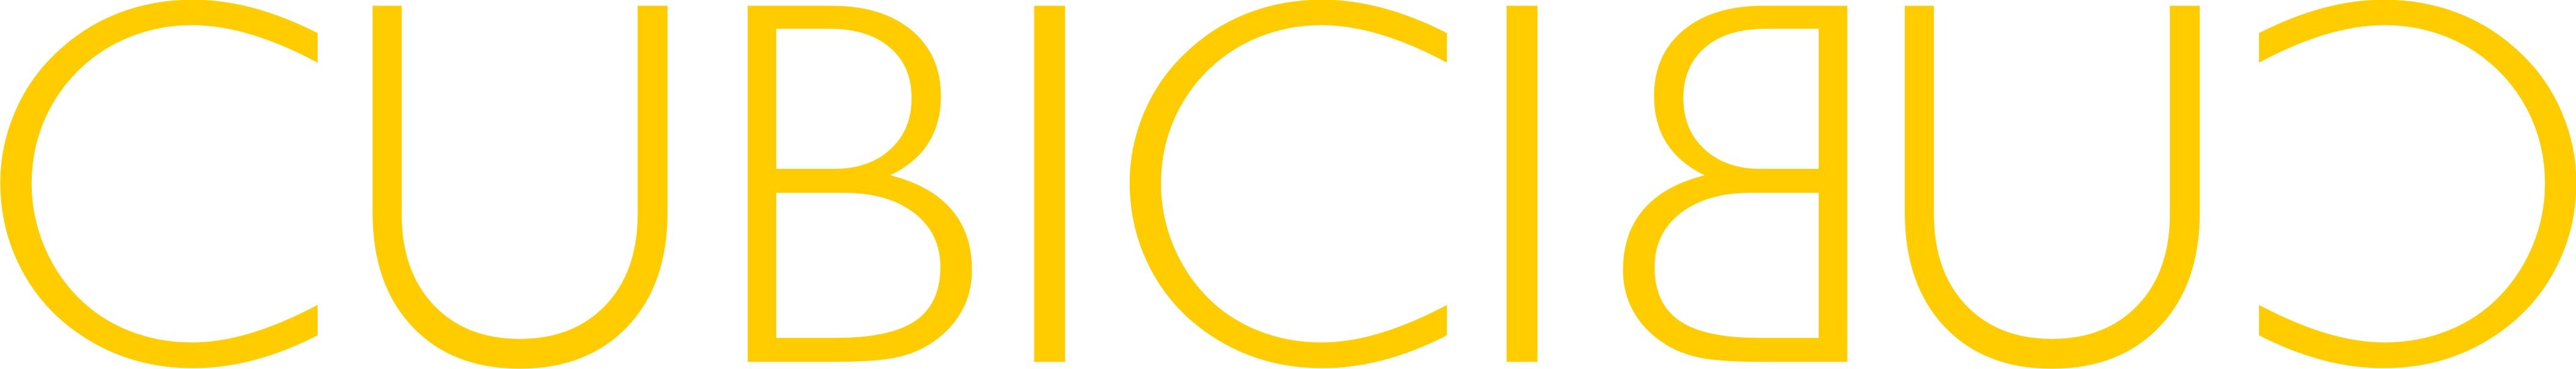 Cubicibuc Name Logo